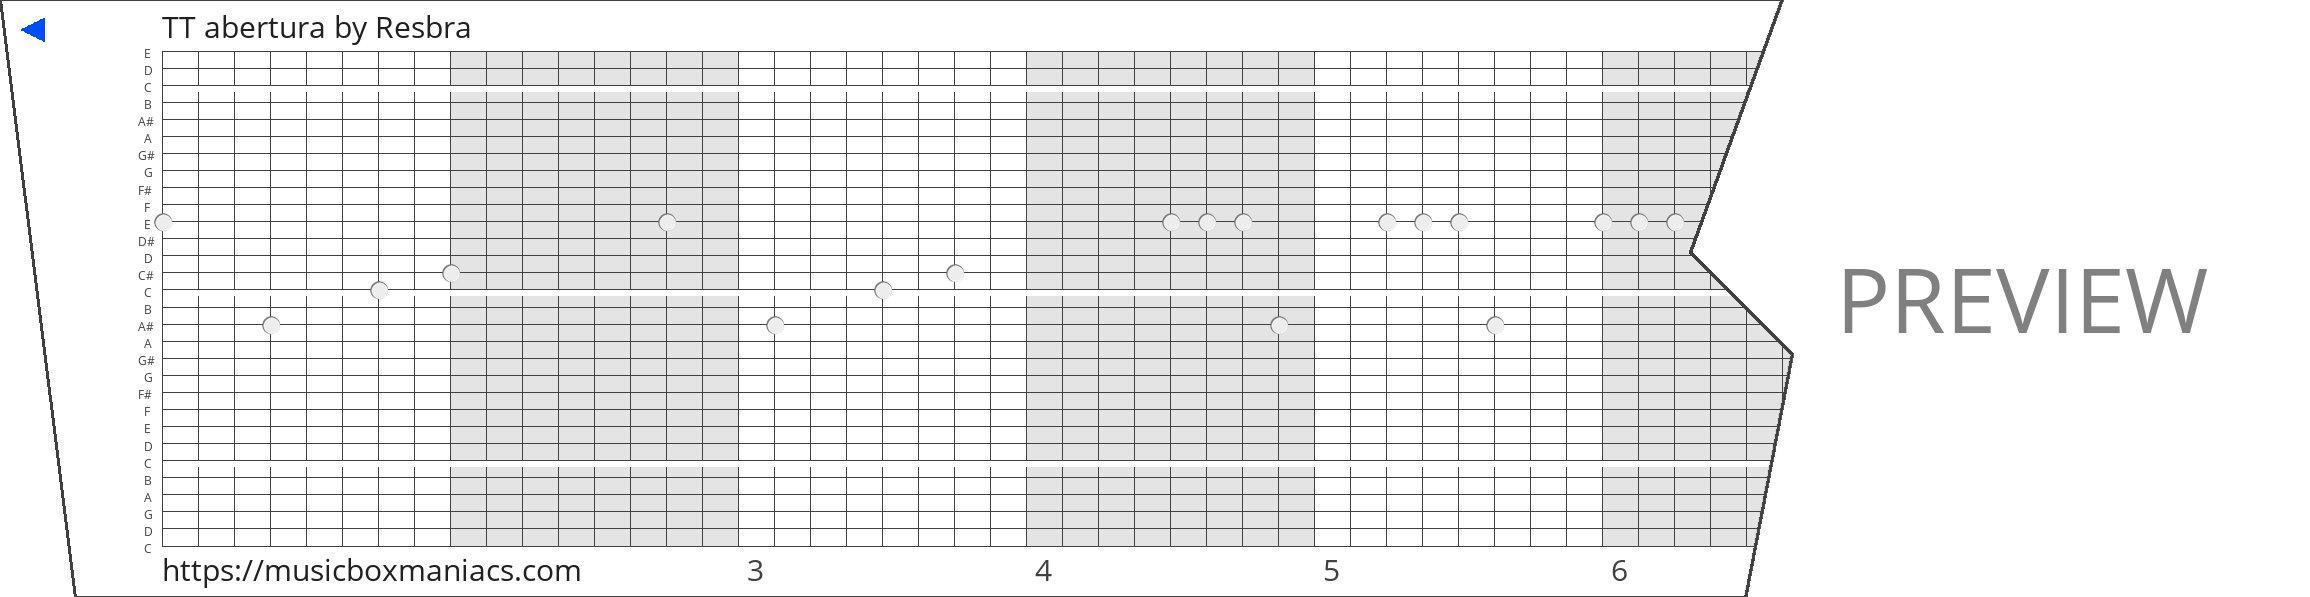 TT abertura 30 note music box paper strip